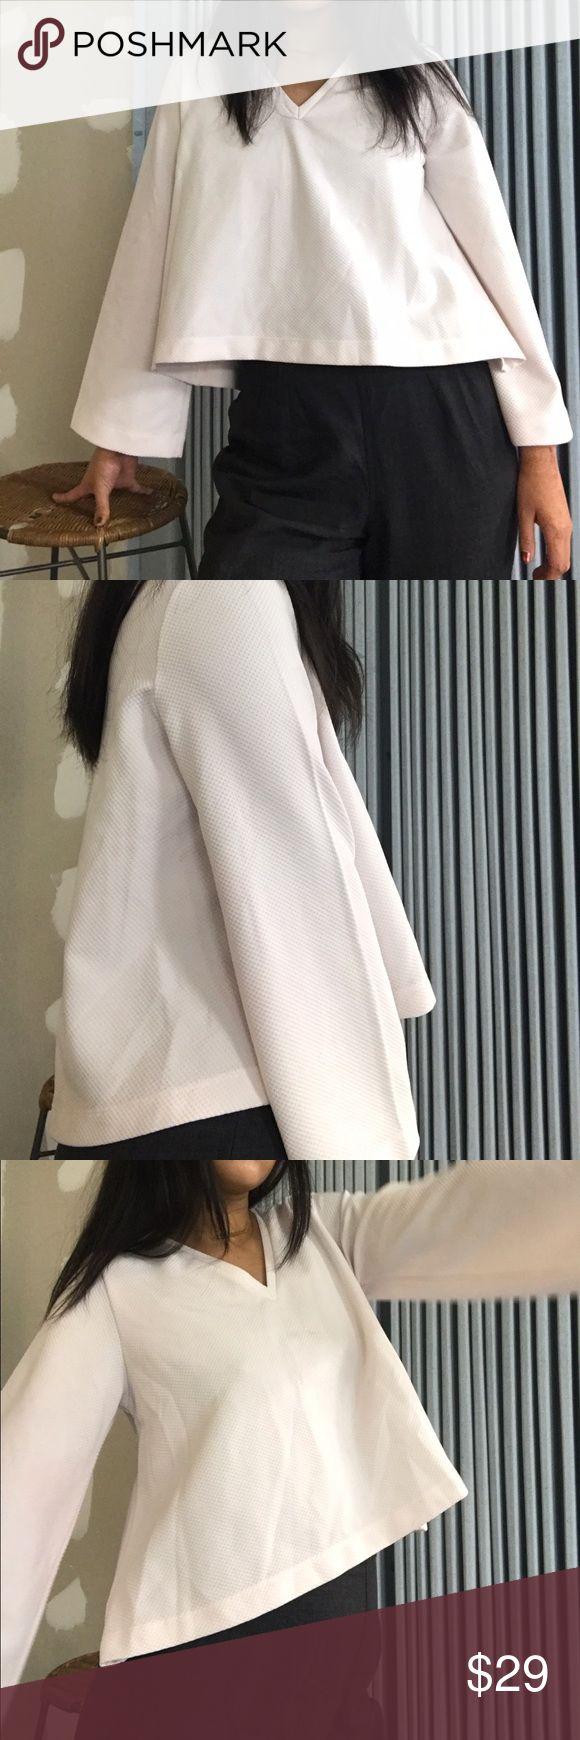 Zara High Neck Lace Blouse 57